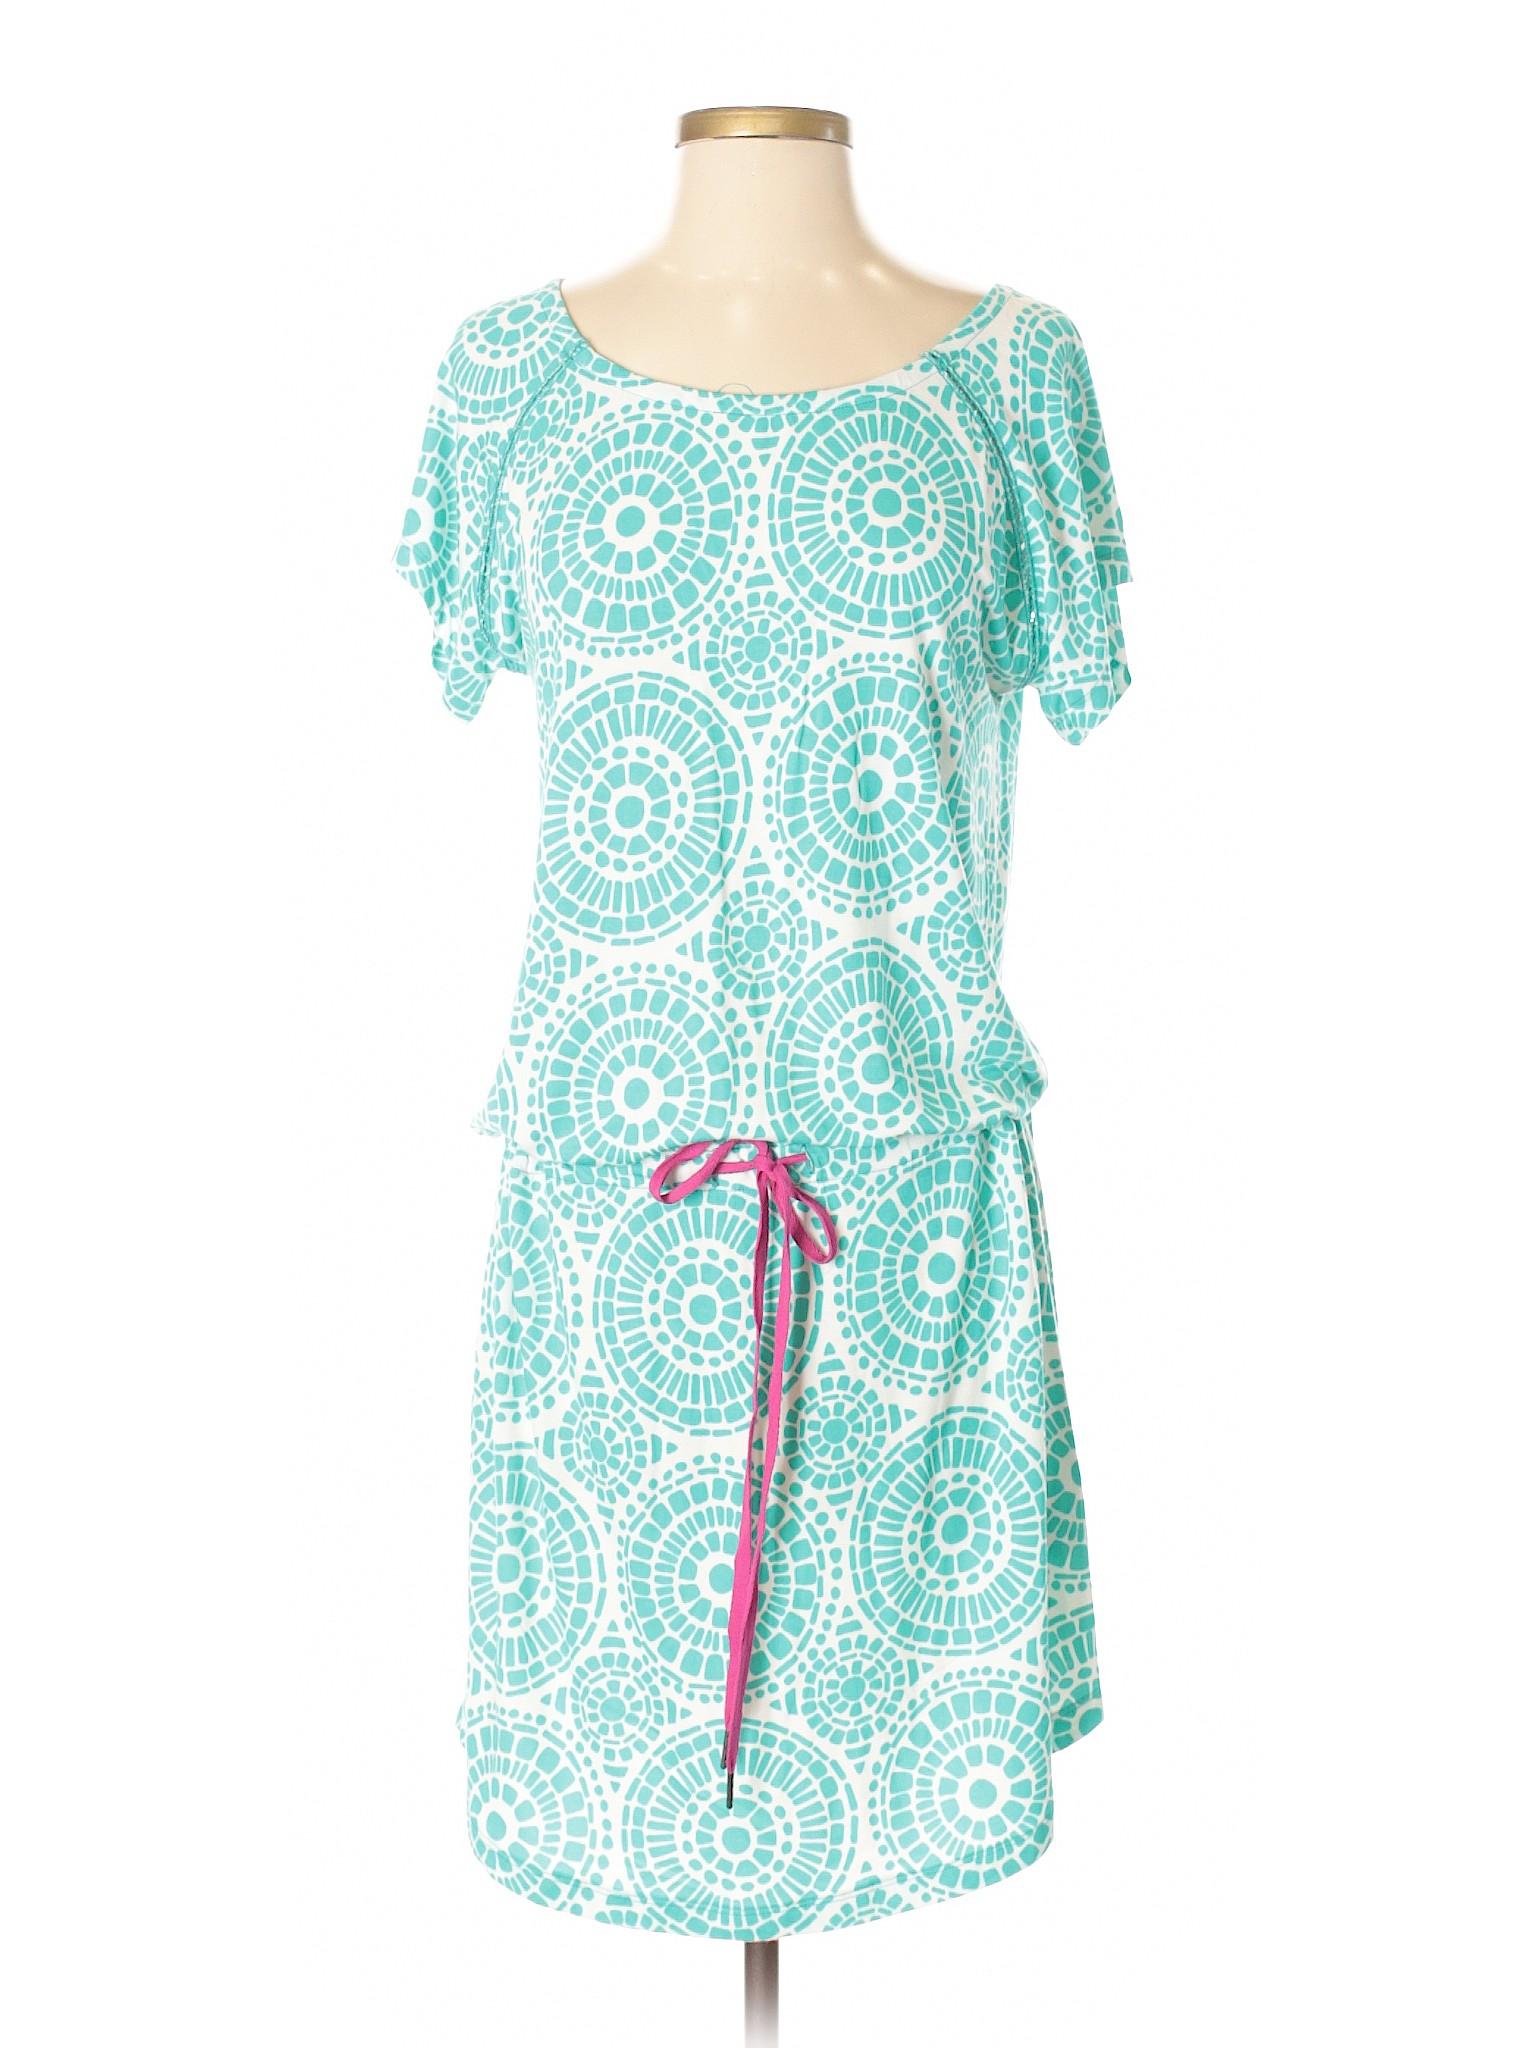 Selling Casual Selling Selling Casual Selling Dress Hatley Casual Hatley Dress Casual Dress Hatley Hatley rIrwH